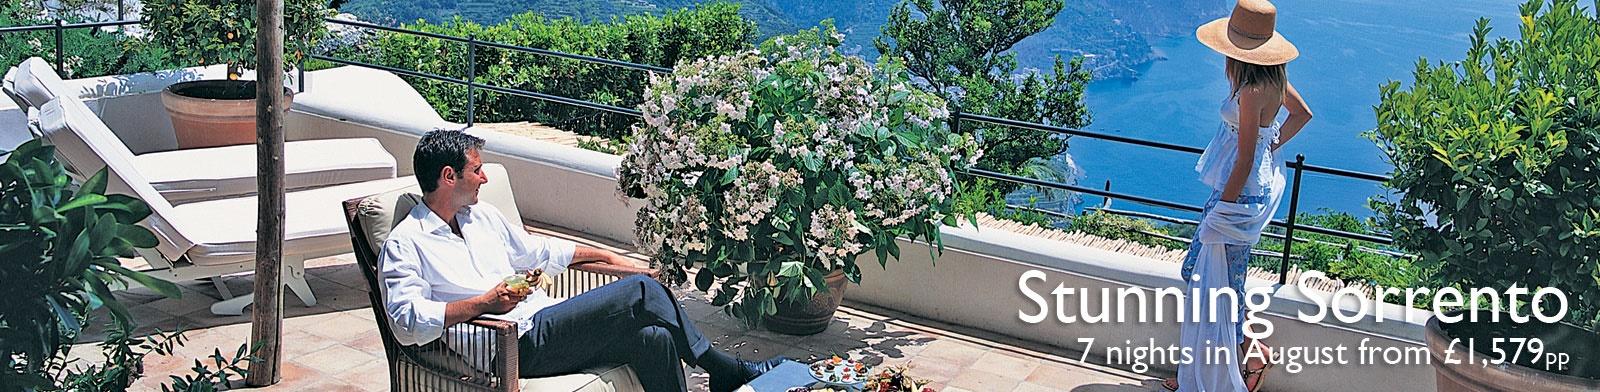 Campania holidays